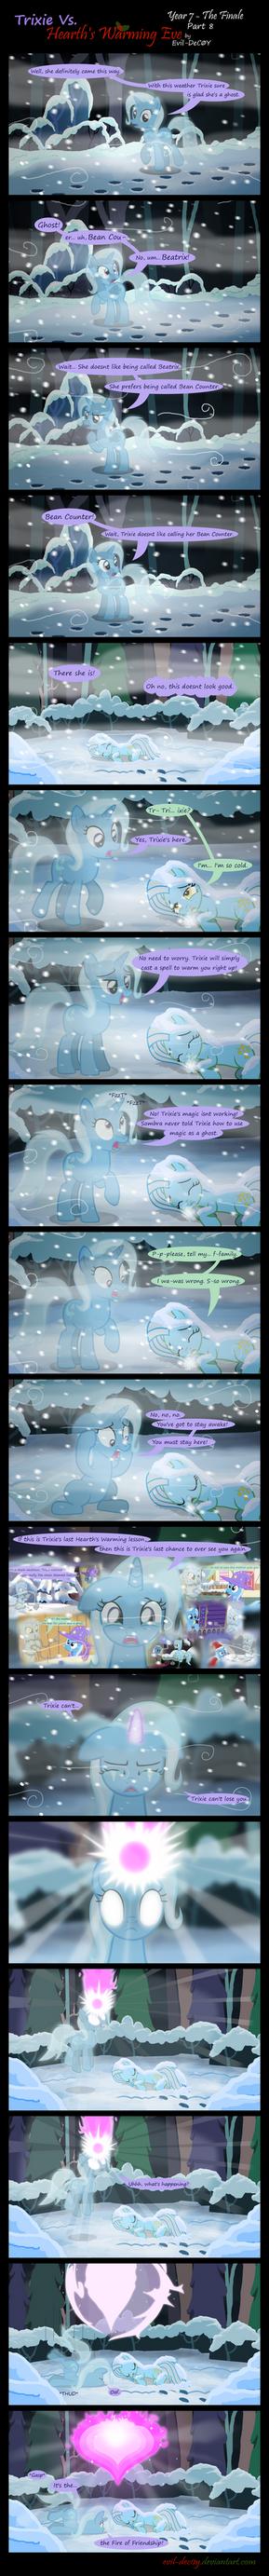 Trixie Vs. Hearth's Warming Eve: Finale (Part 8) by Evil-DeC0Y